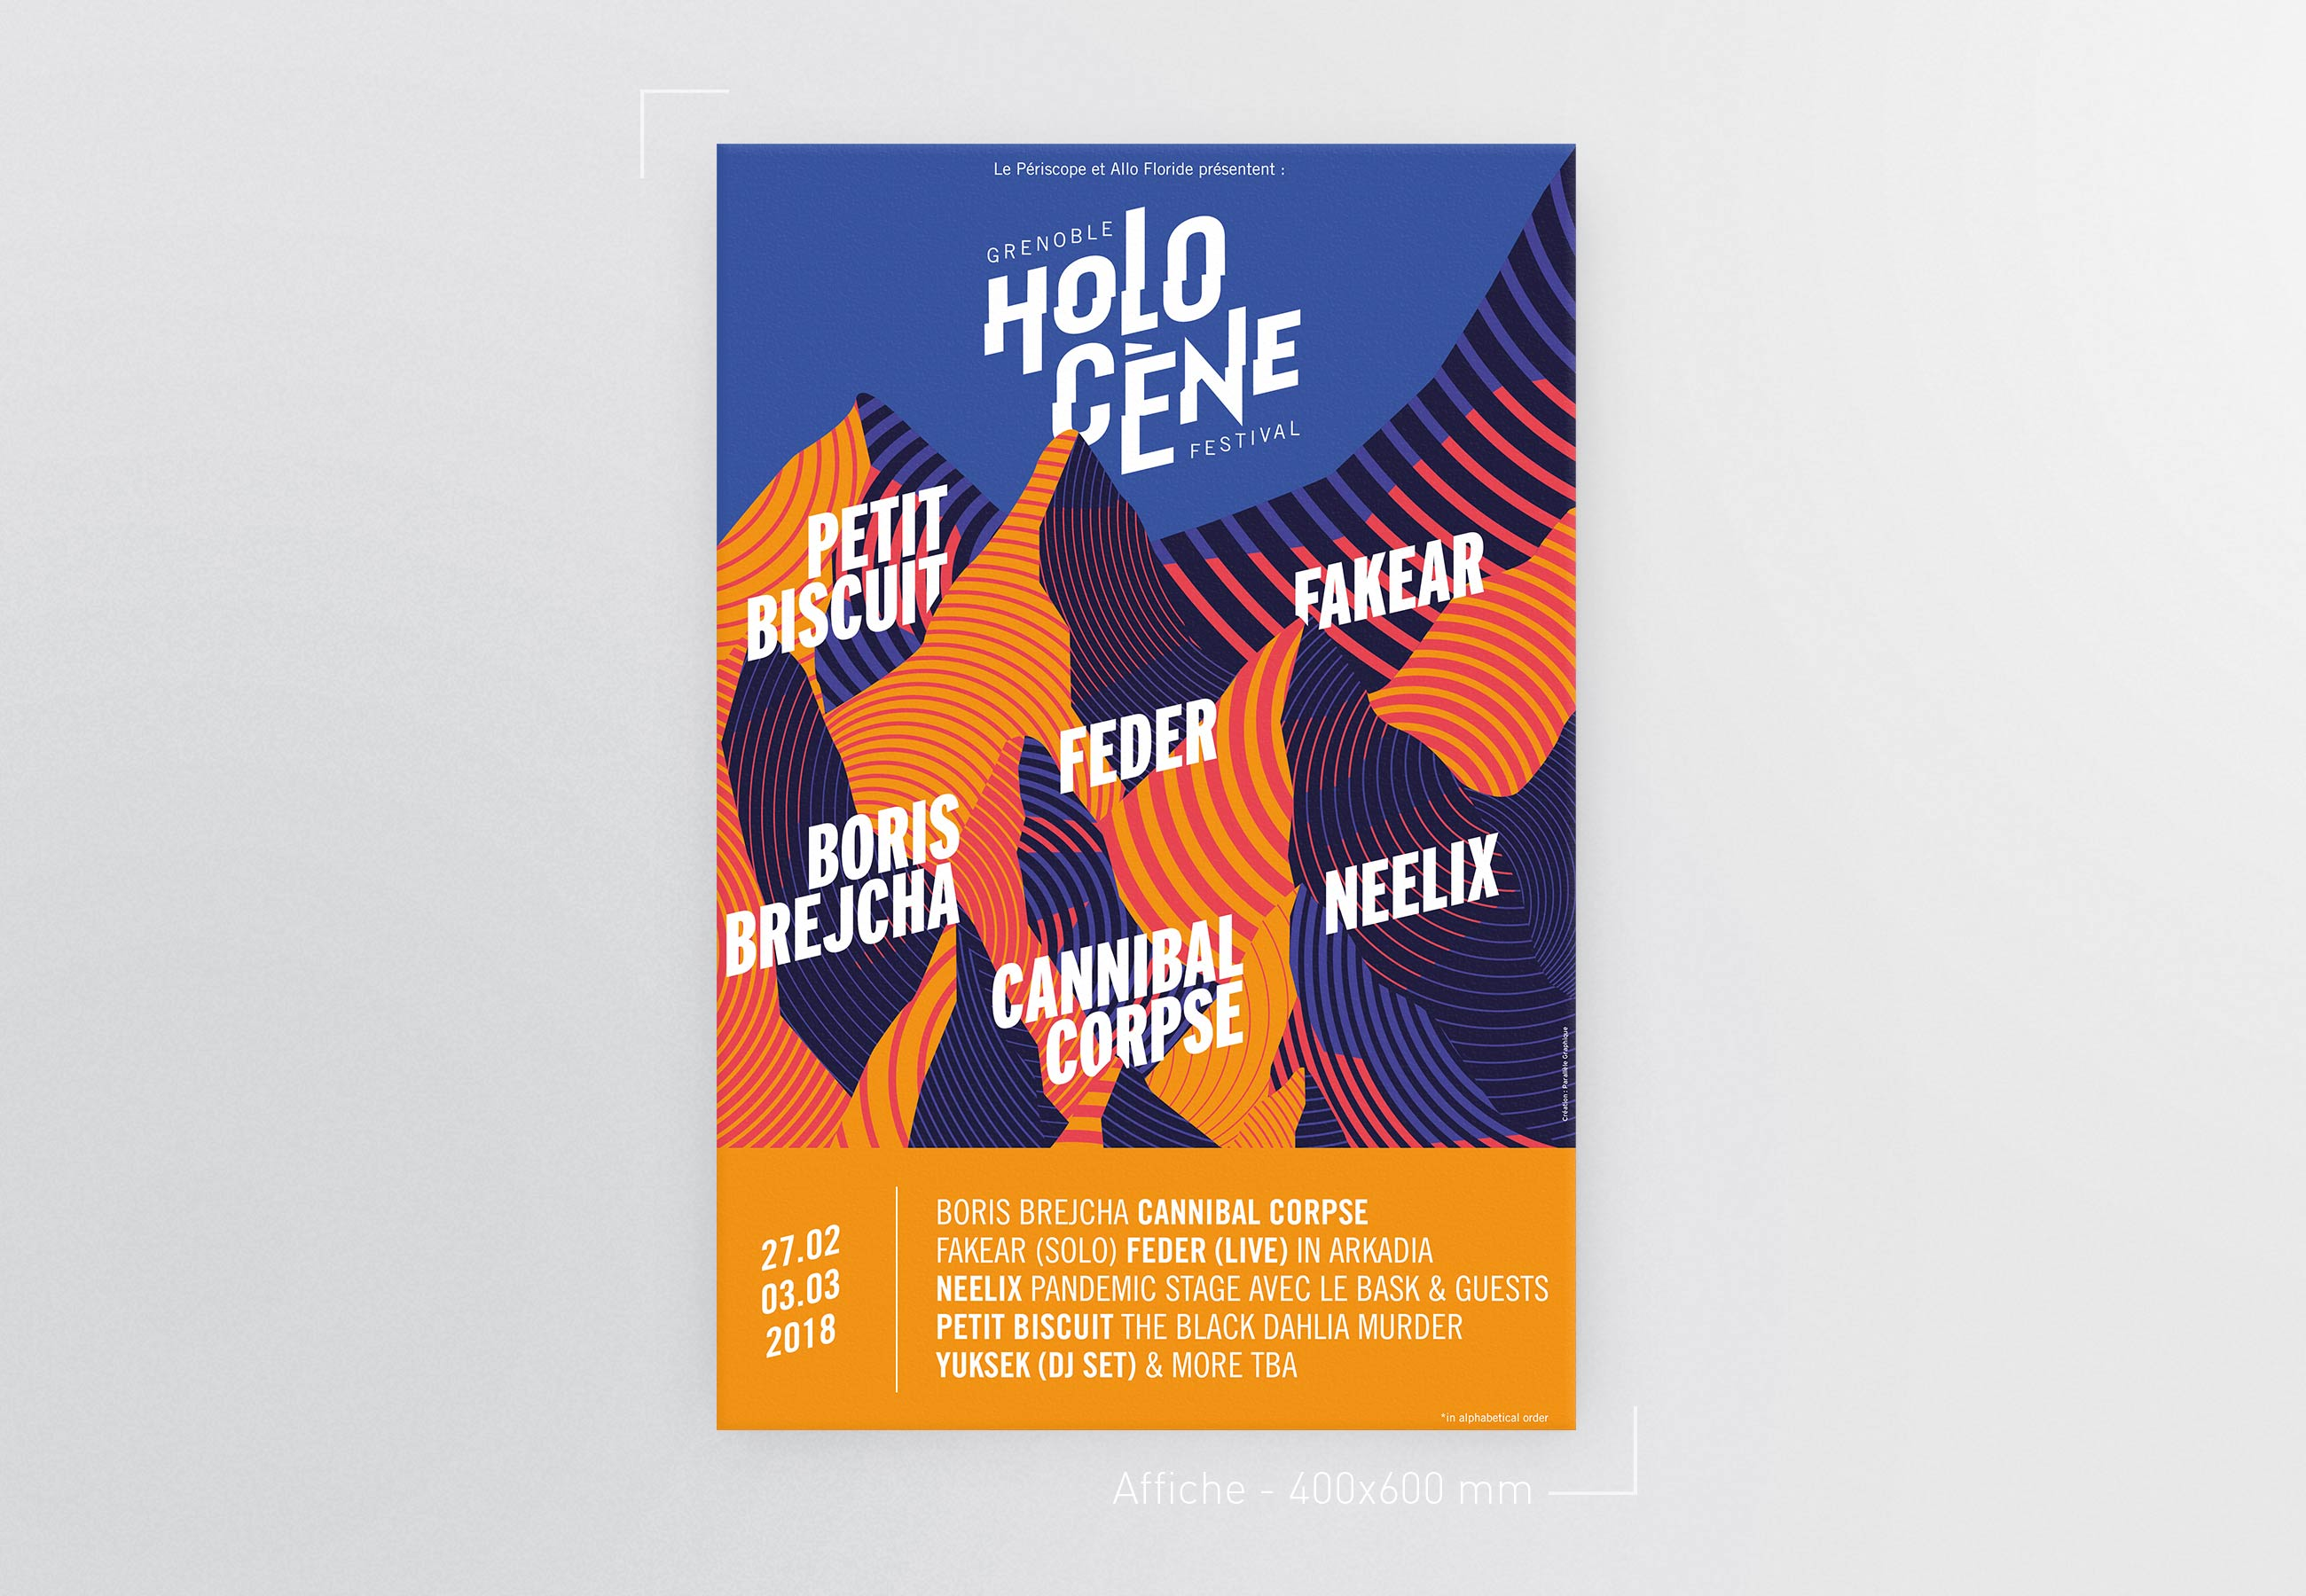 holocene_01_parallele_graphique